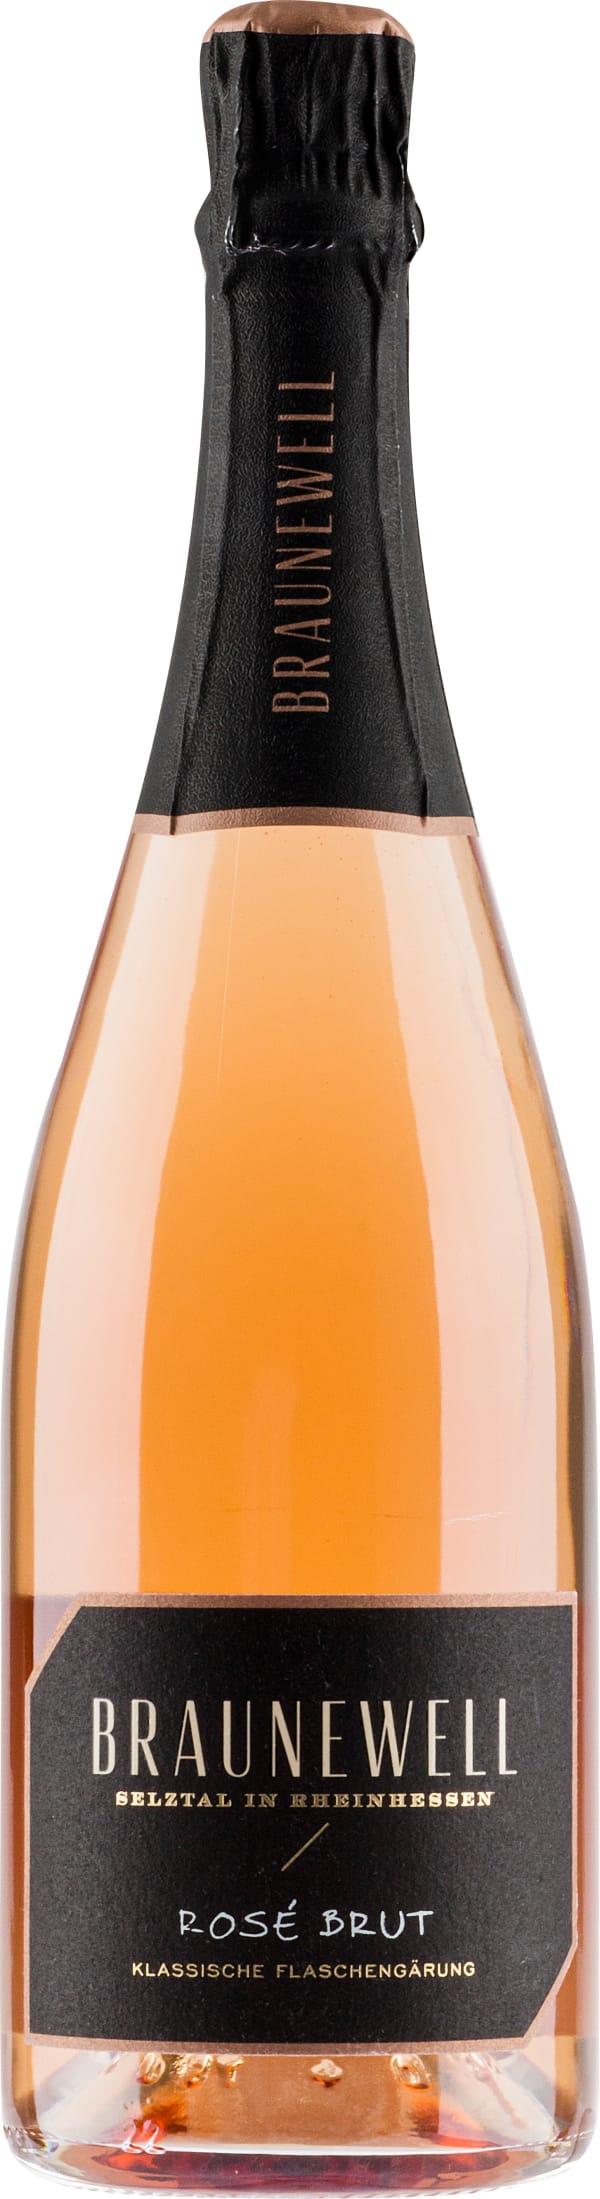 Braunewell Pinot Rose Brut 2016